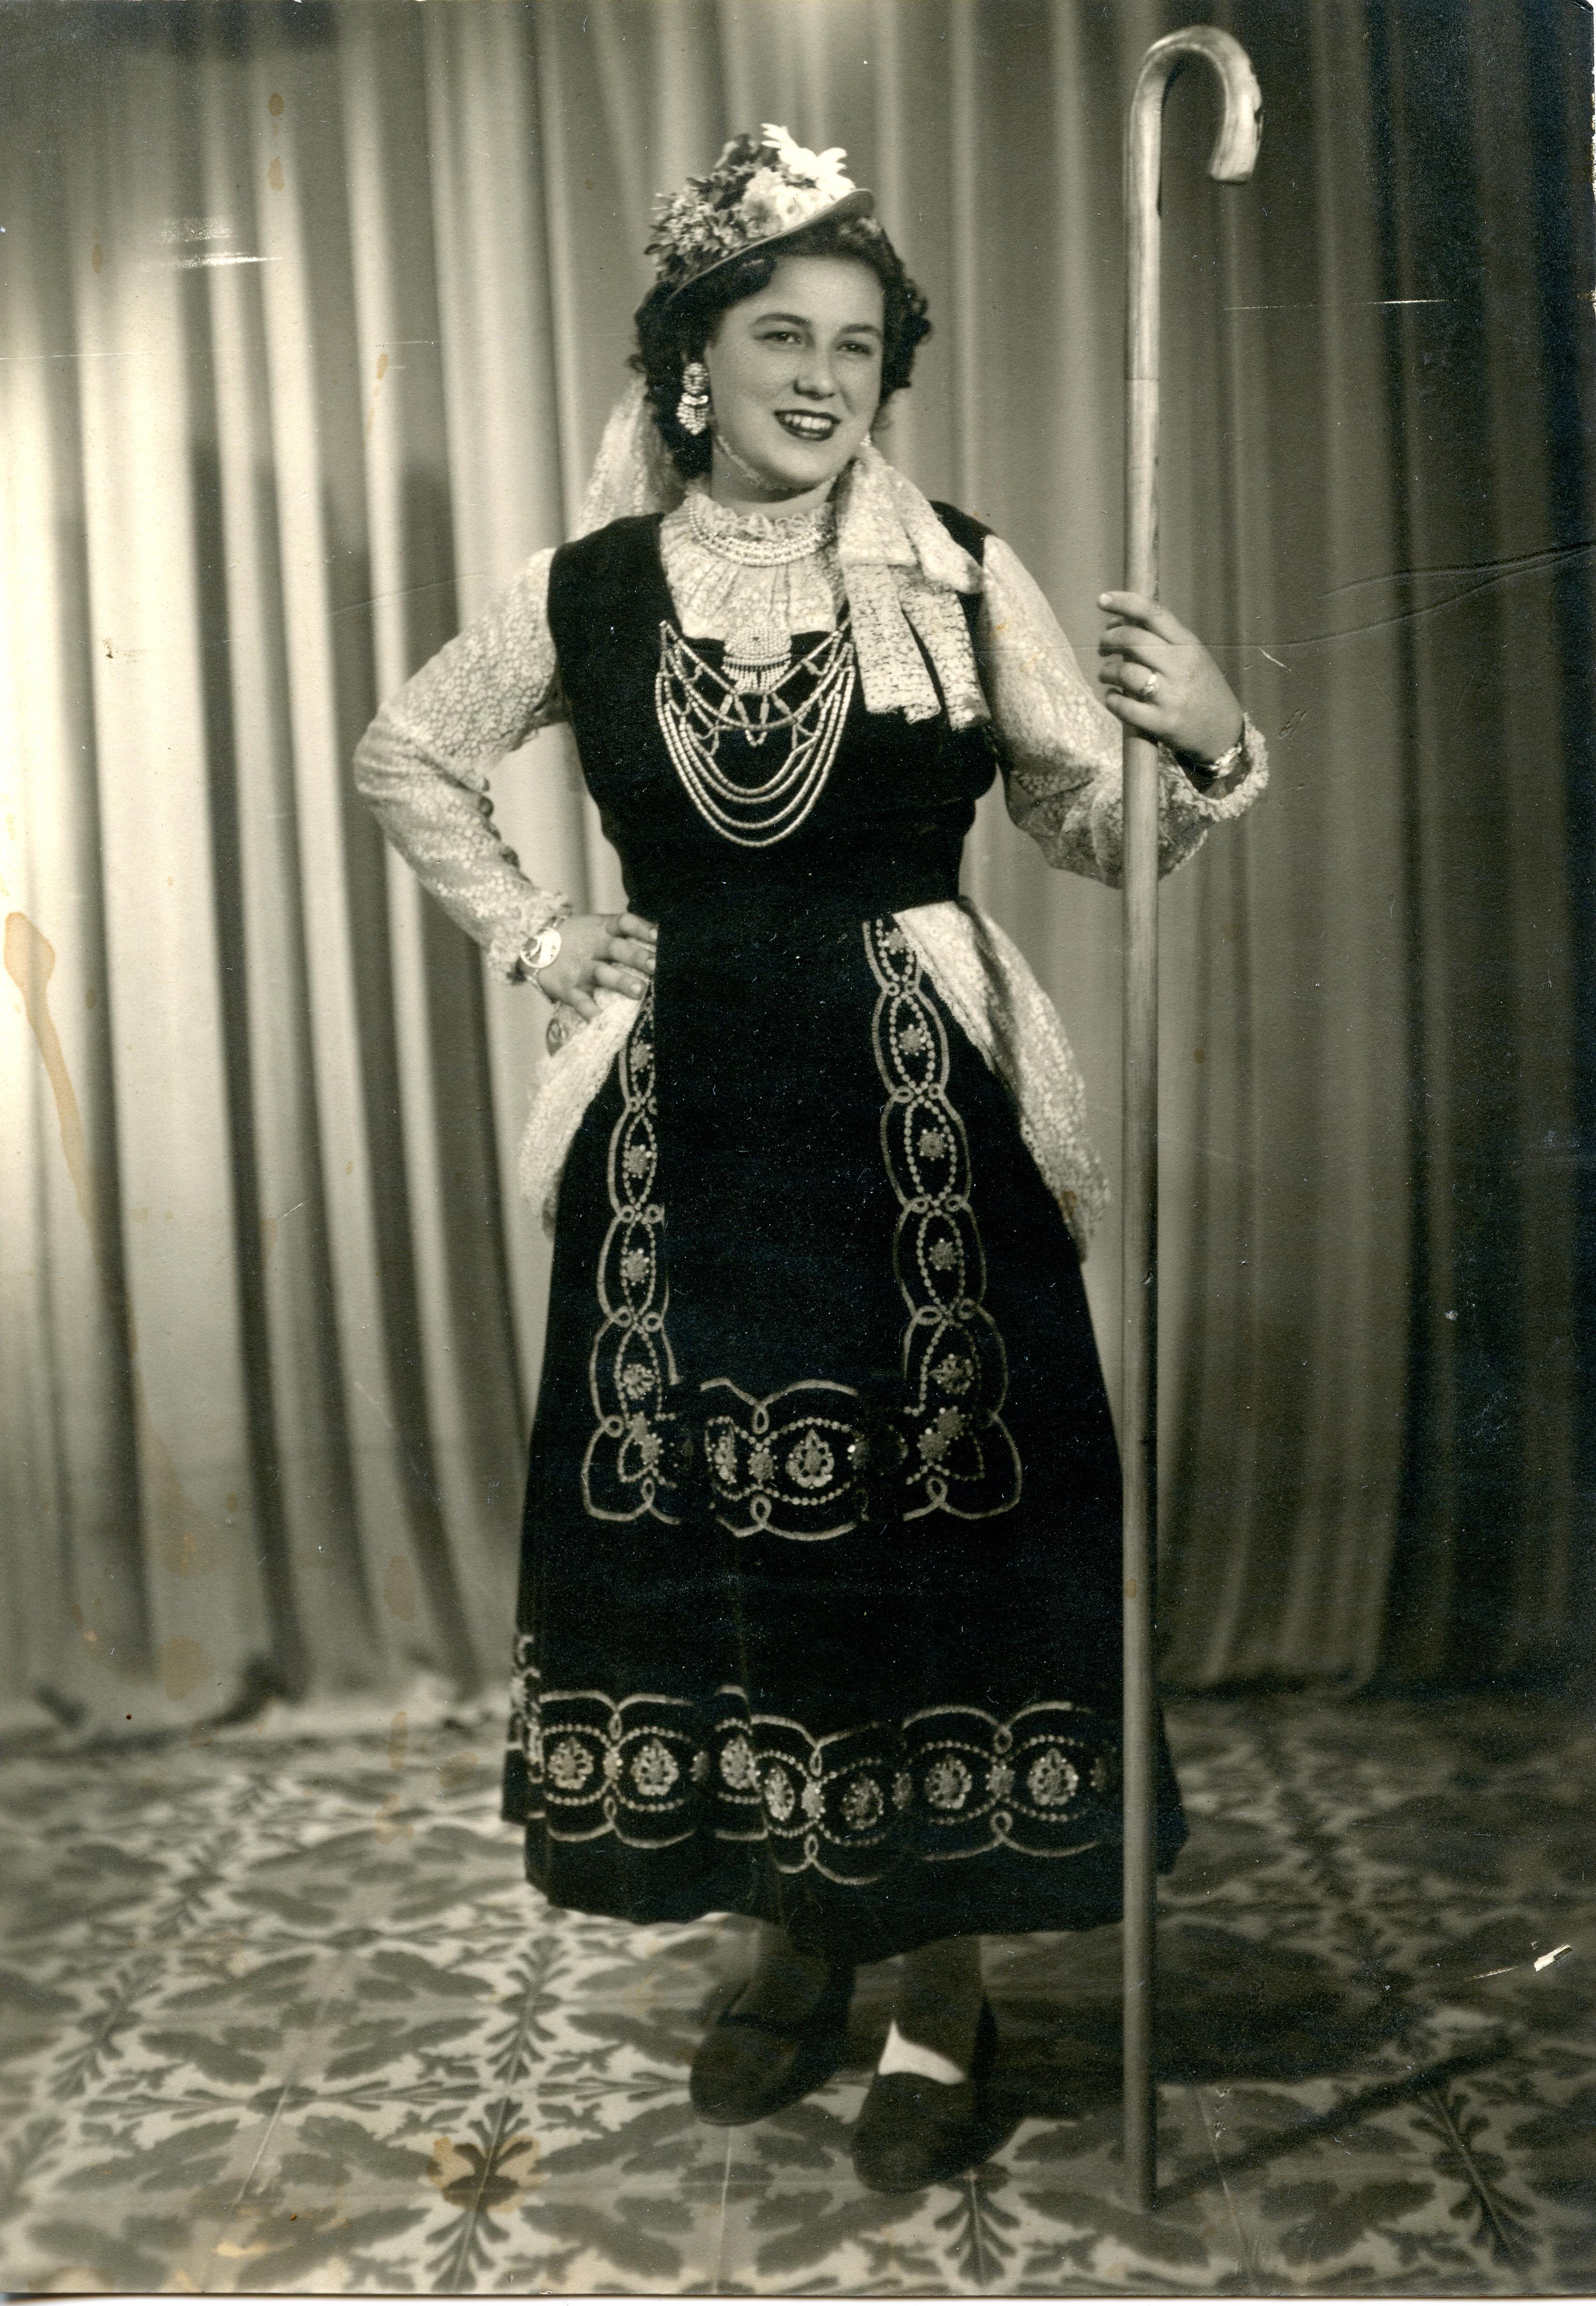 1952 Antonia Carbonell Giménez